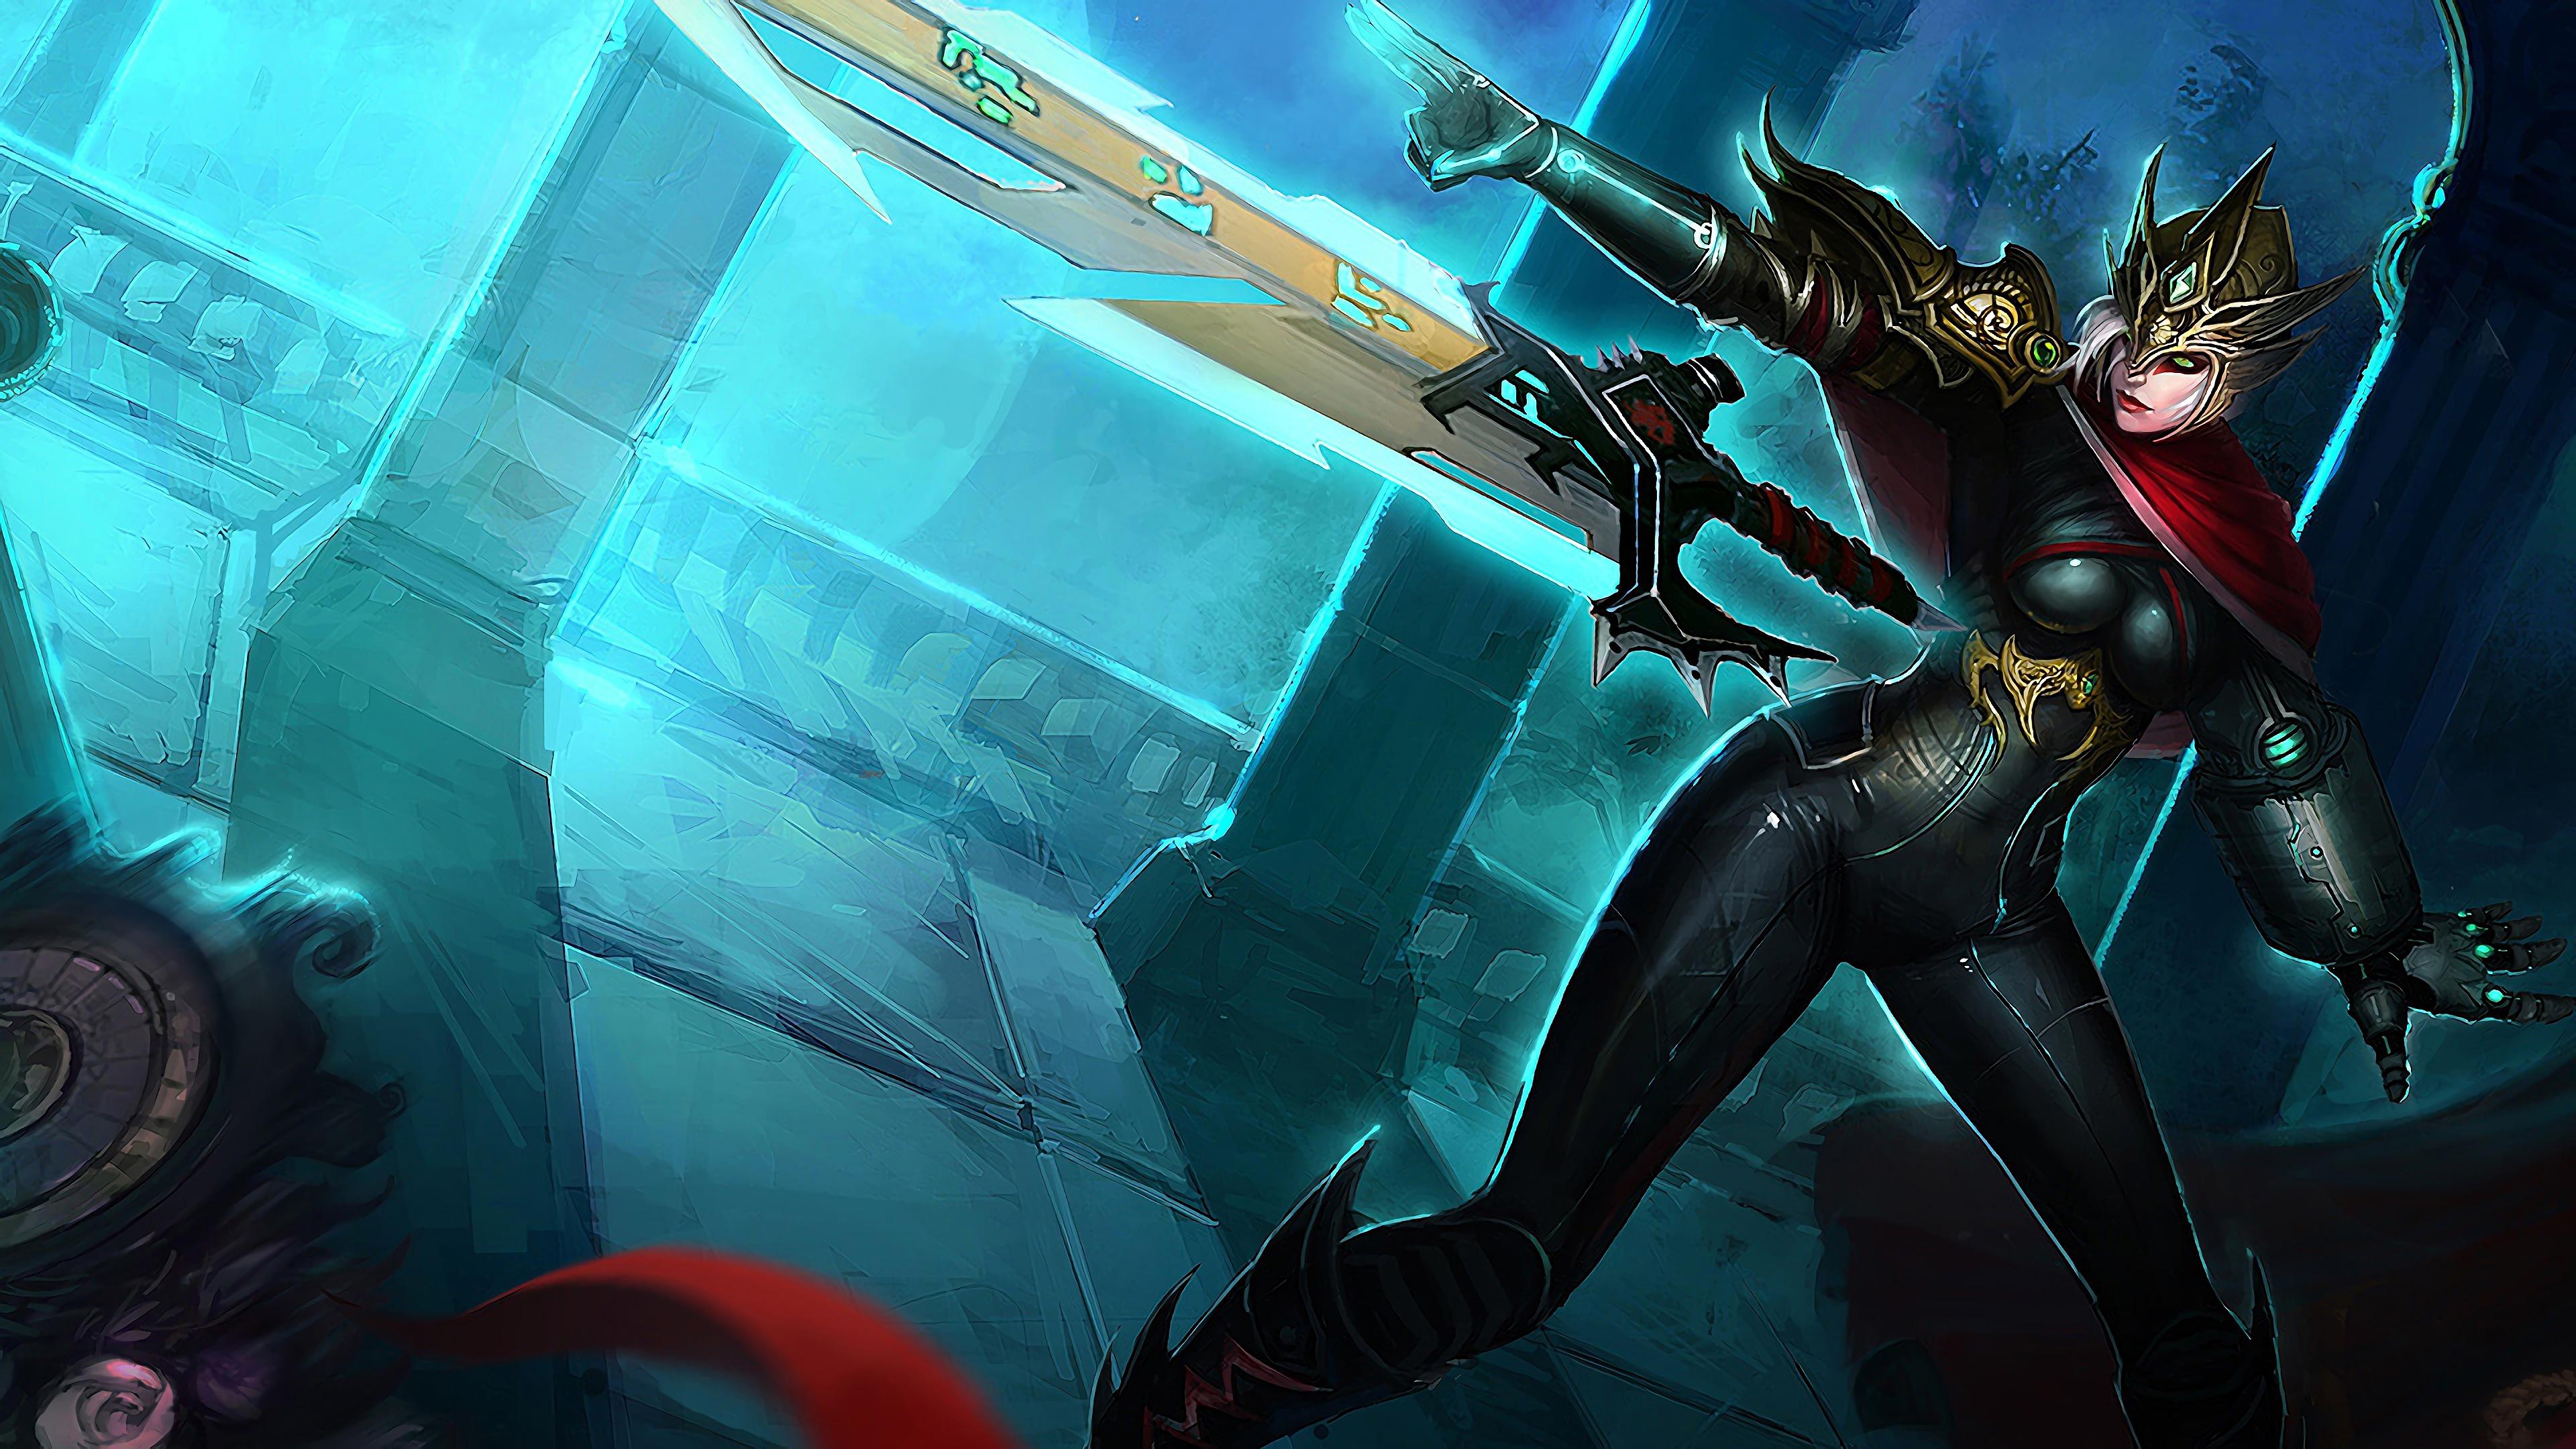 crimson elite riven lol splash art league of legends 1574100336 - Crimson Elite Riven LoL Splash Art League of Legends - Riven, league of legends